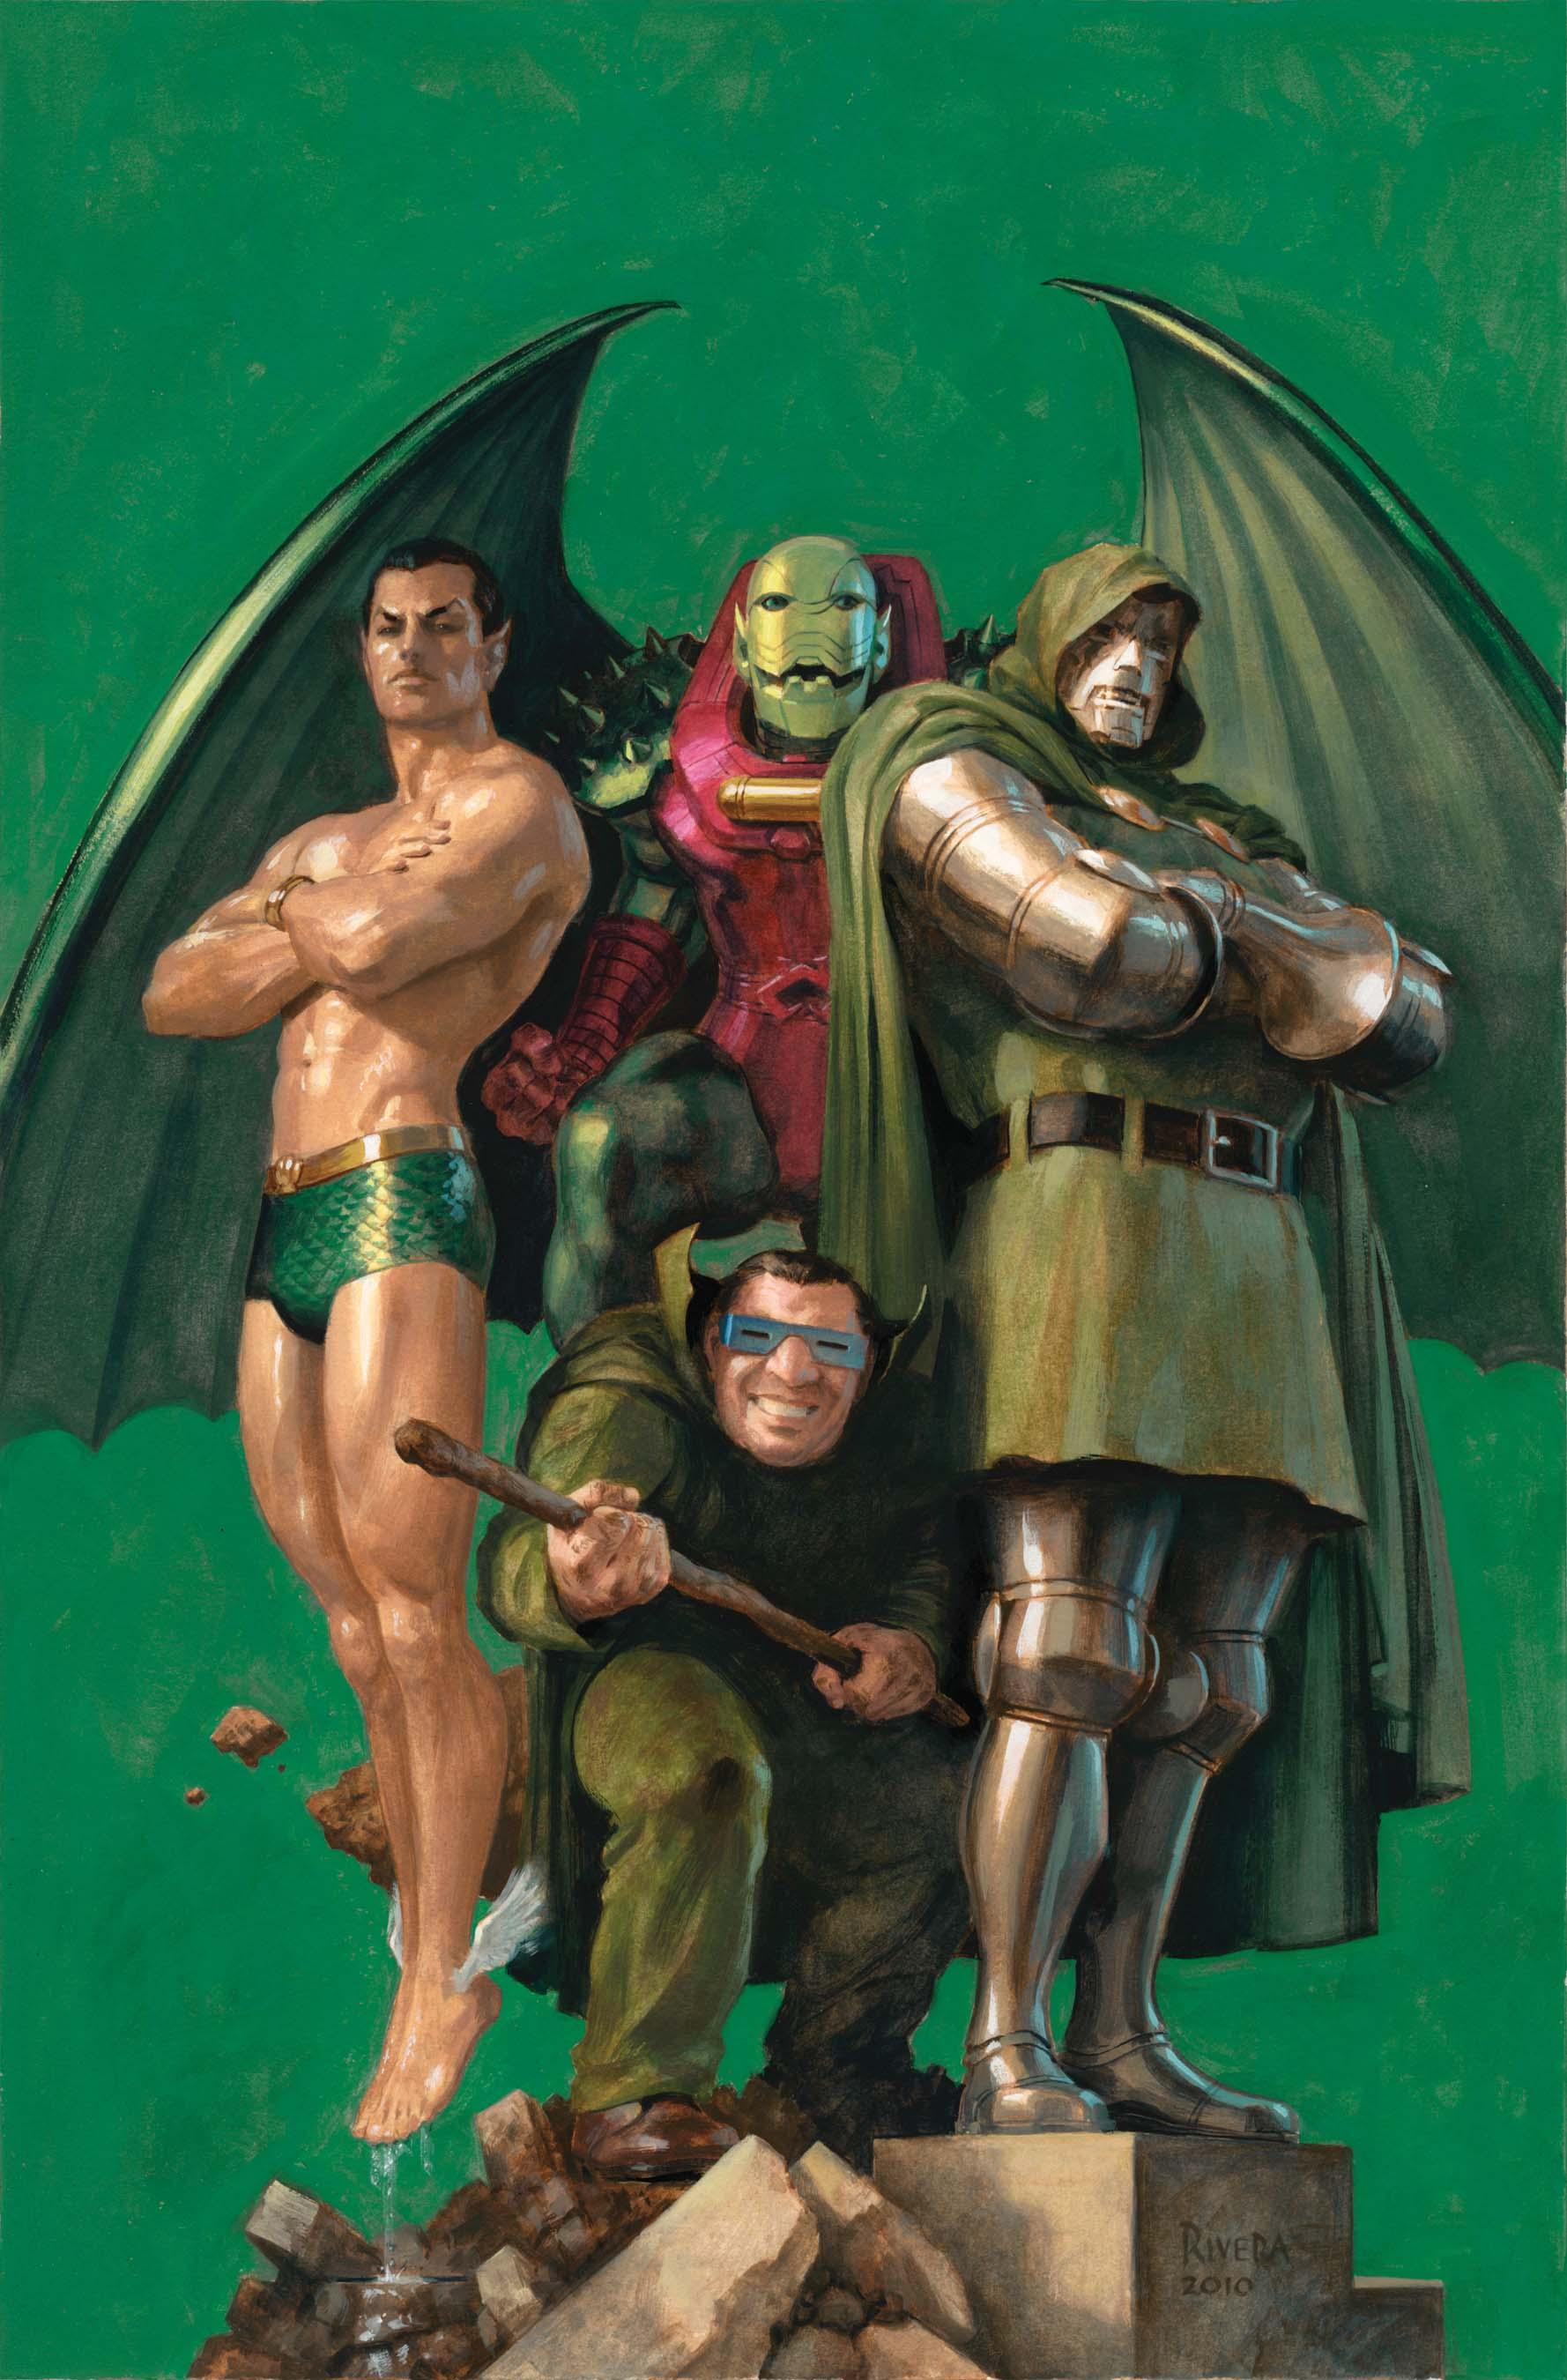 X-Men Legacy (2008) #245 (FANTASTIC FOUR ANNIVERSARY VARIANT)